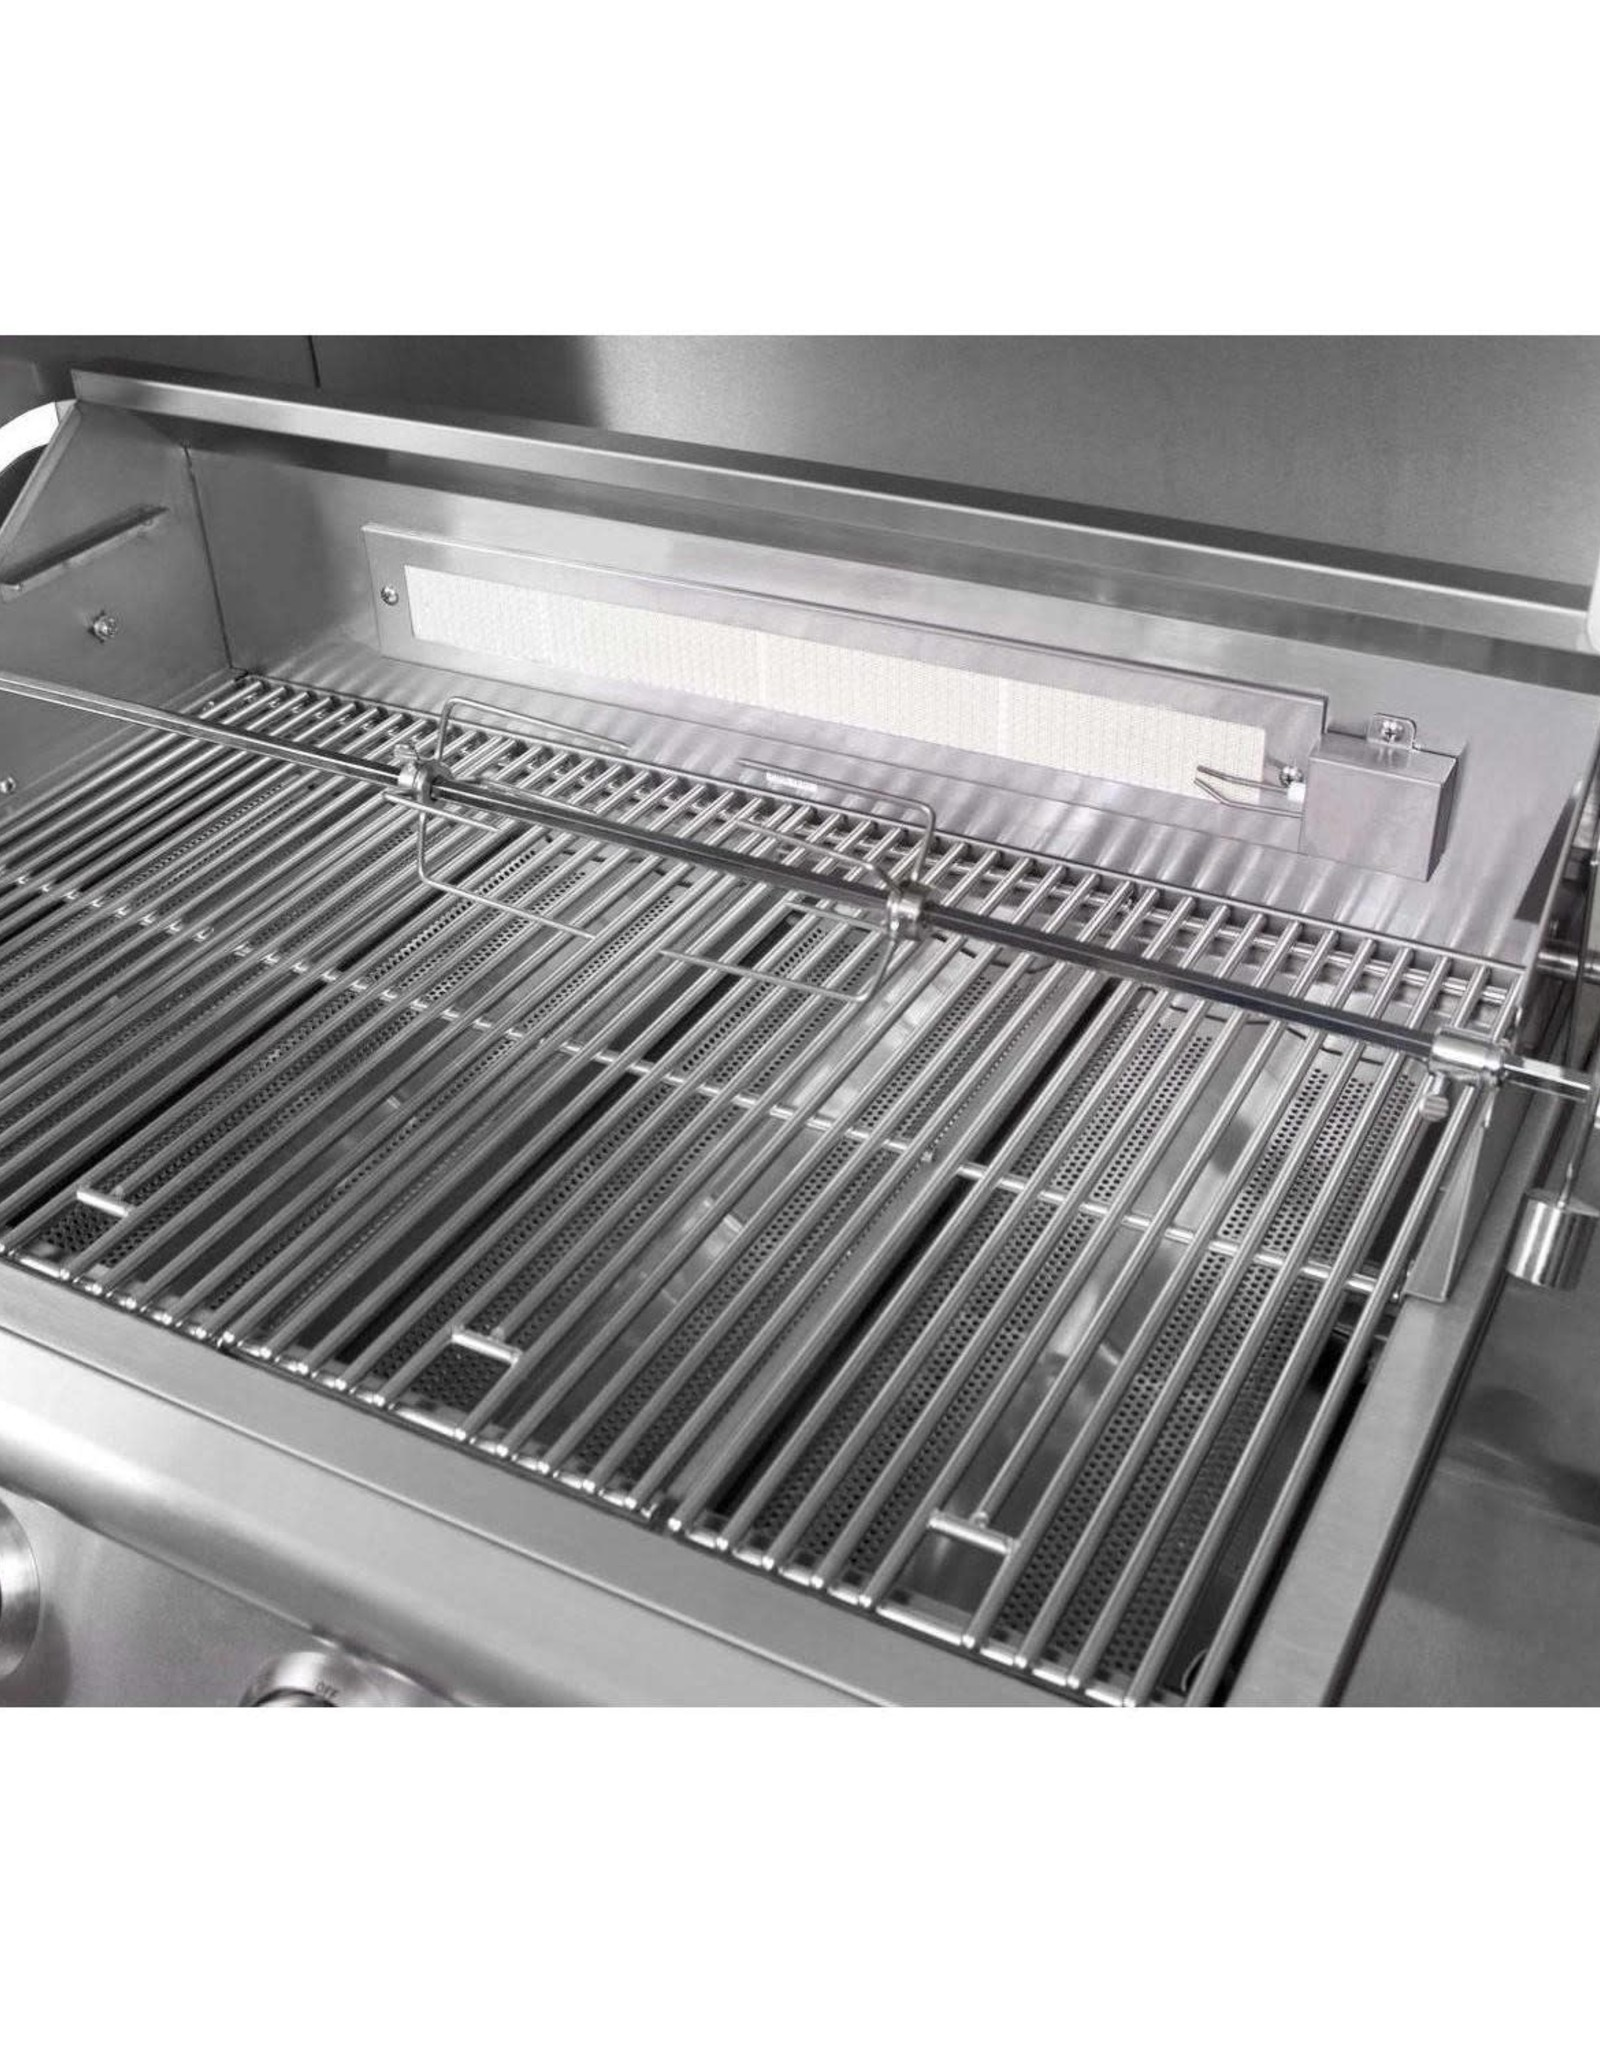 Blaze Outdoor Products Blaze Rotisserie Kit For 40-Inch 5-Burner Gas Grills - BLZ-5-ROTIS-SS